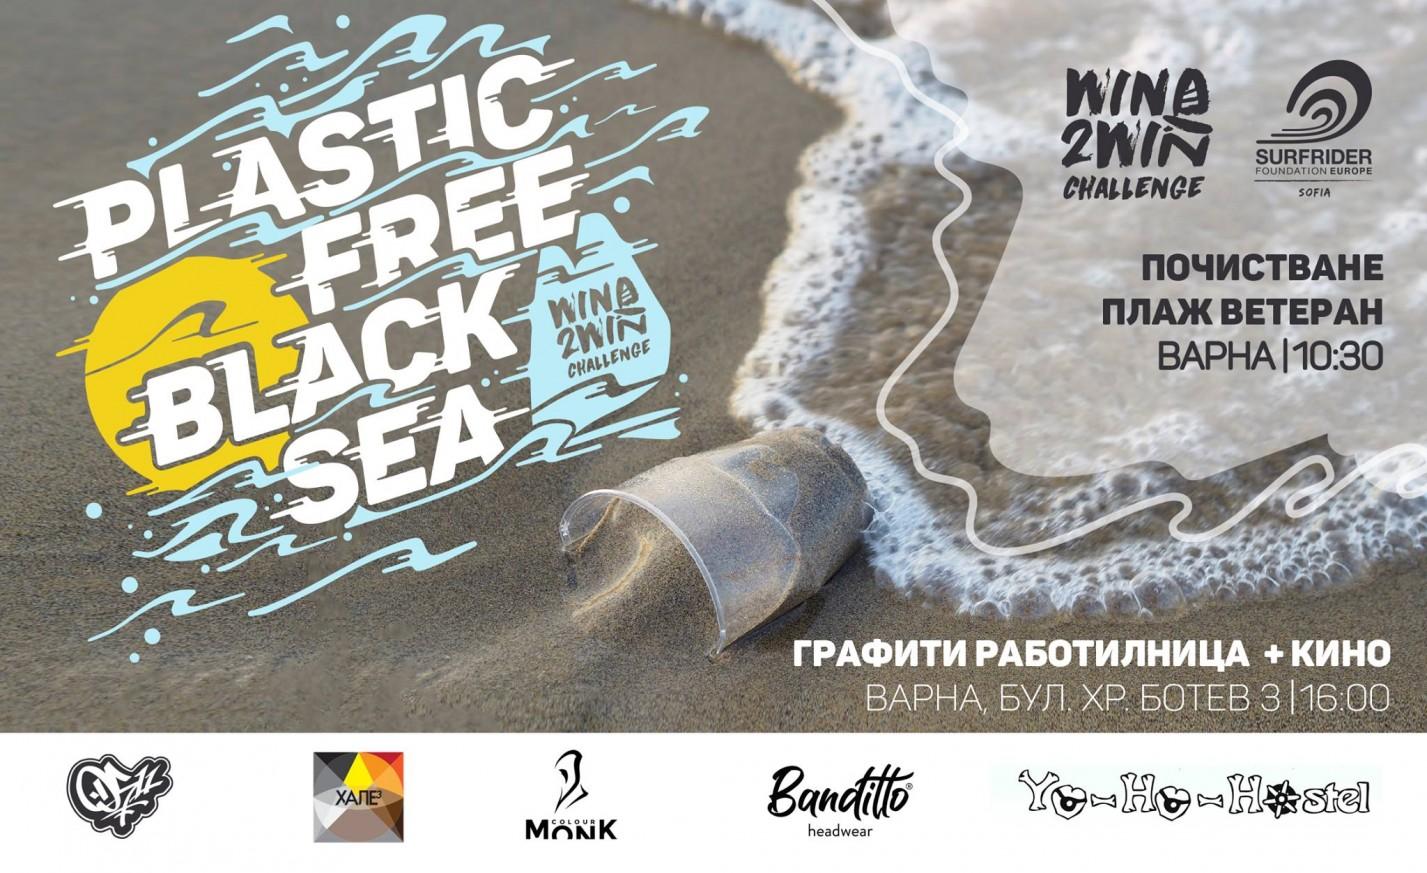 Plastic Free Black Sea - cleaning of beach Veteran